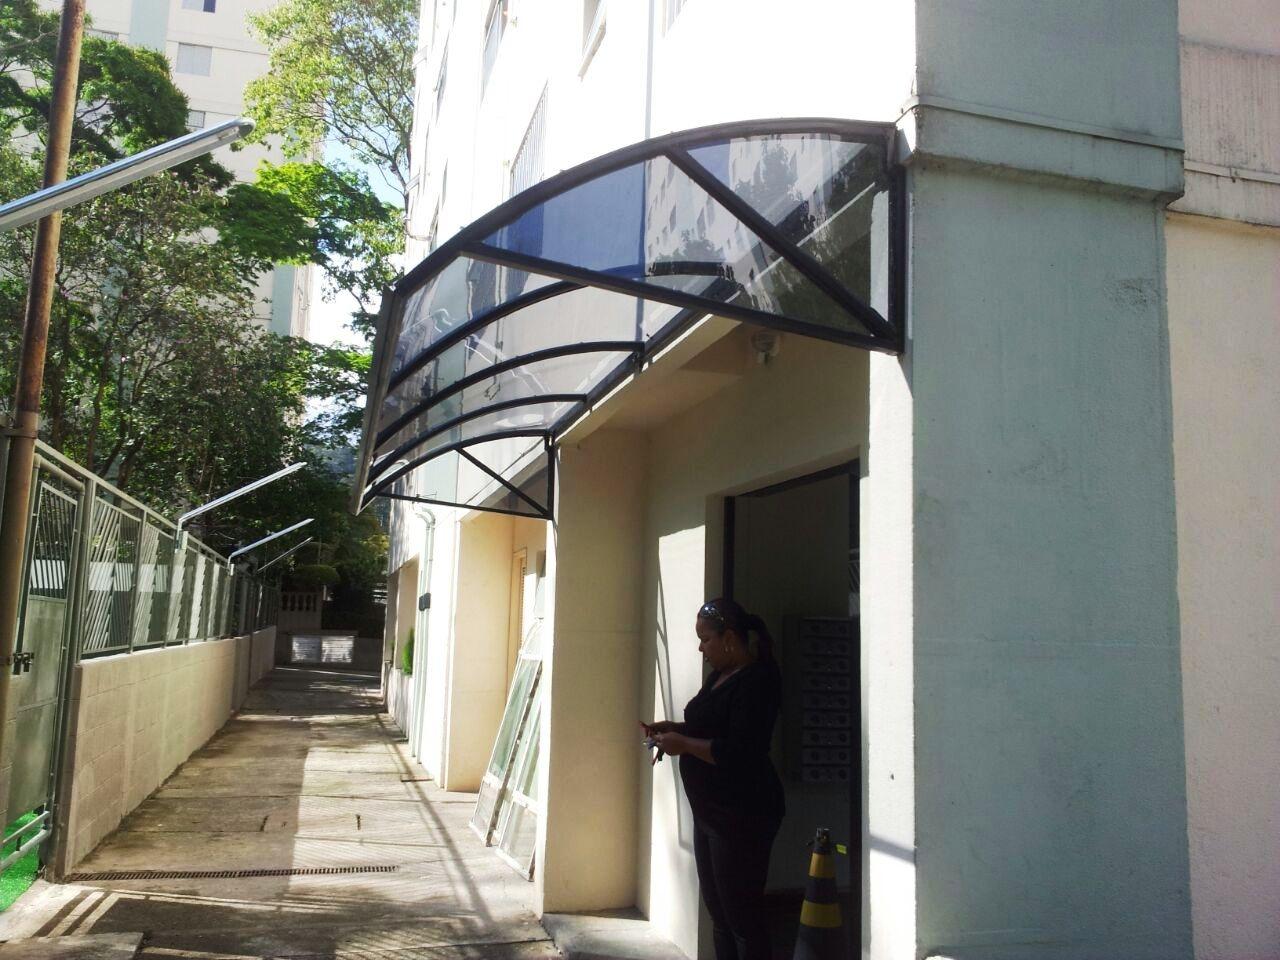 Empresa de Toldos e Coberturas Serviços na Anália Franco - Empresa de Coberturas em São Paulo